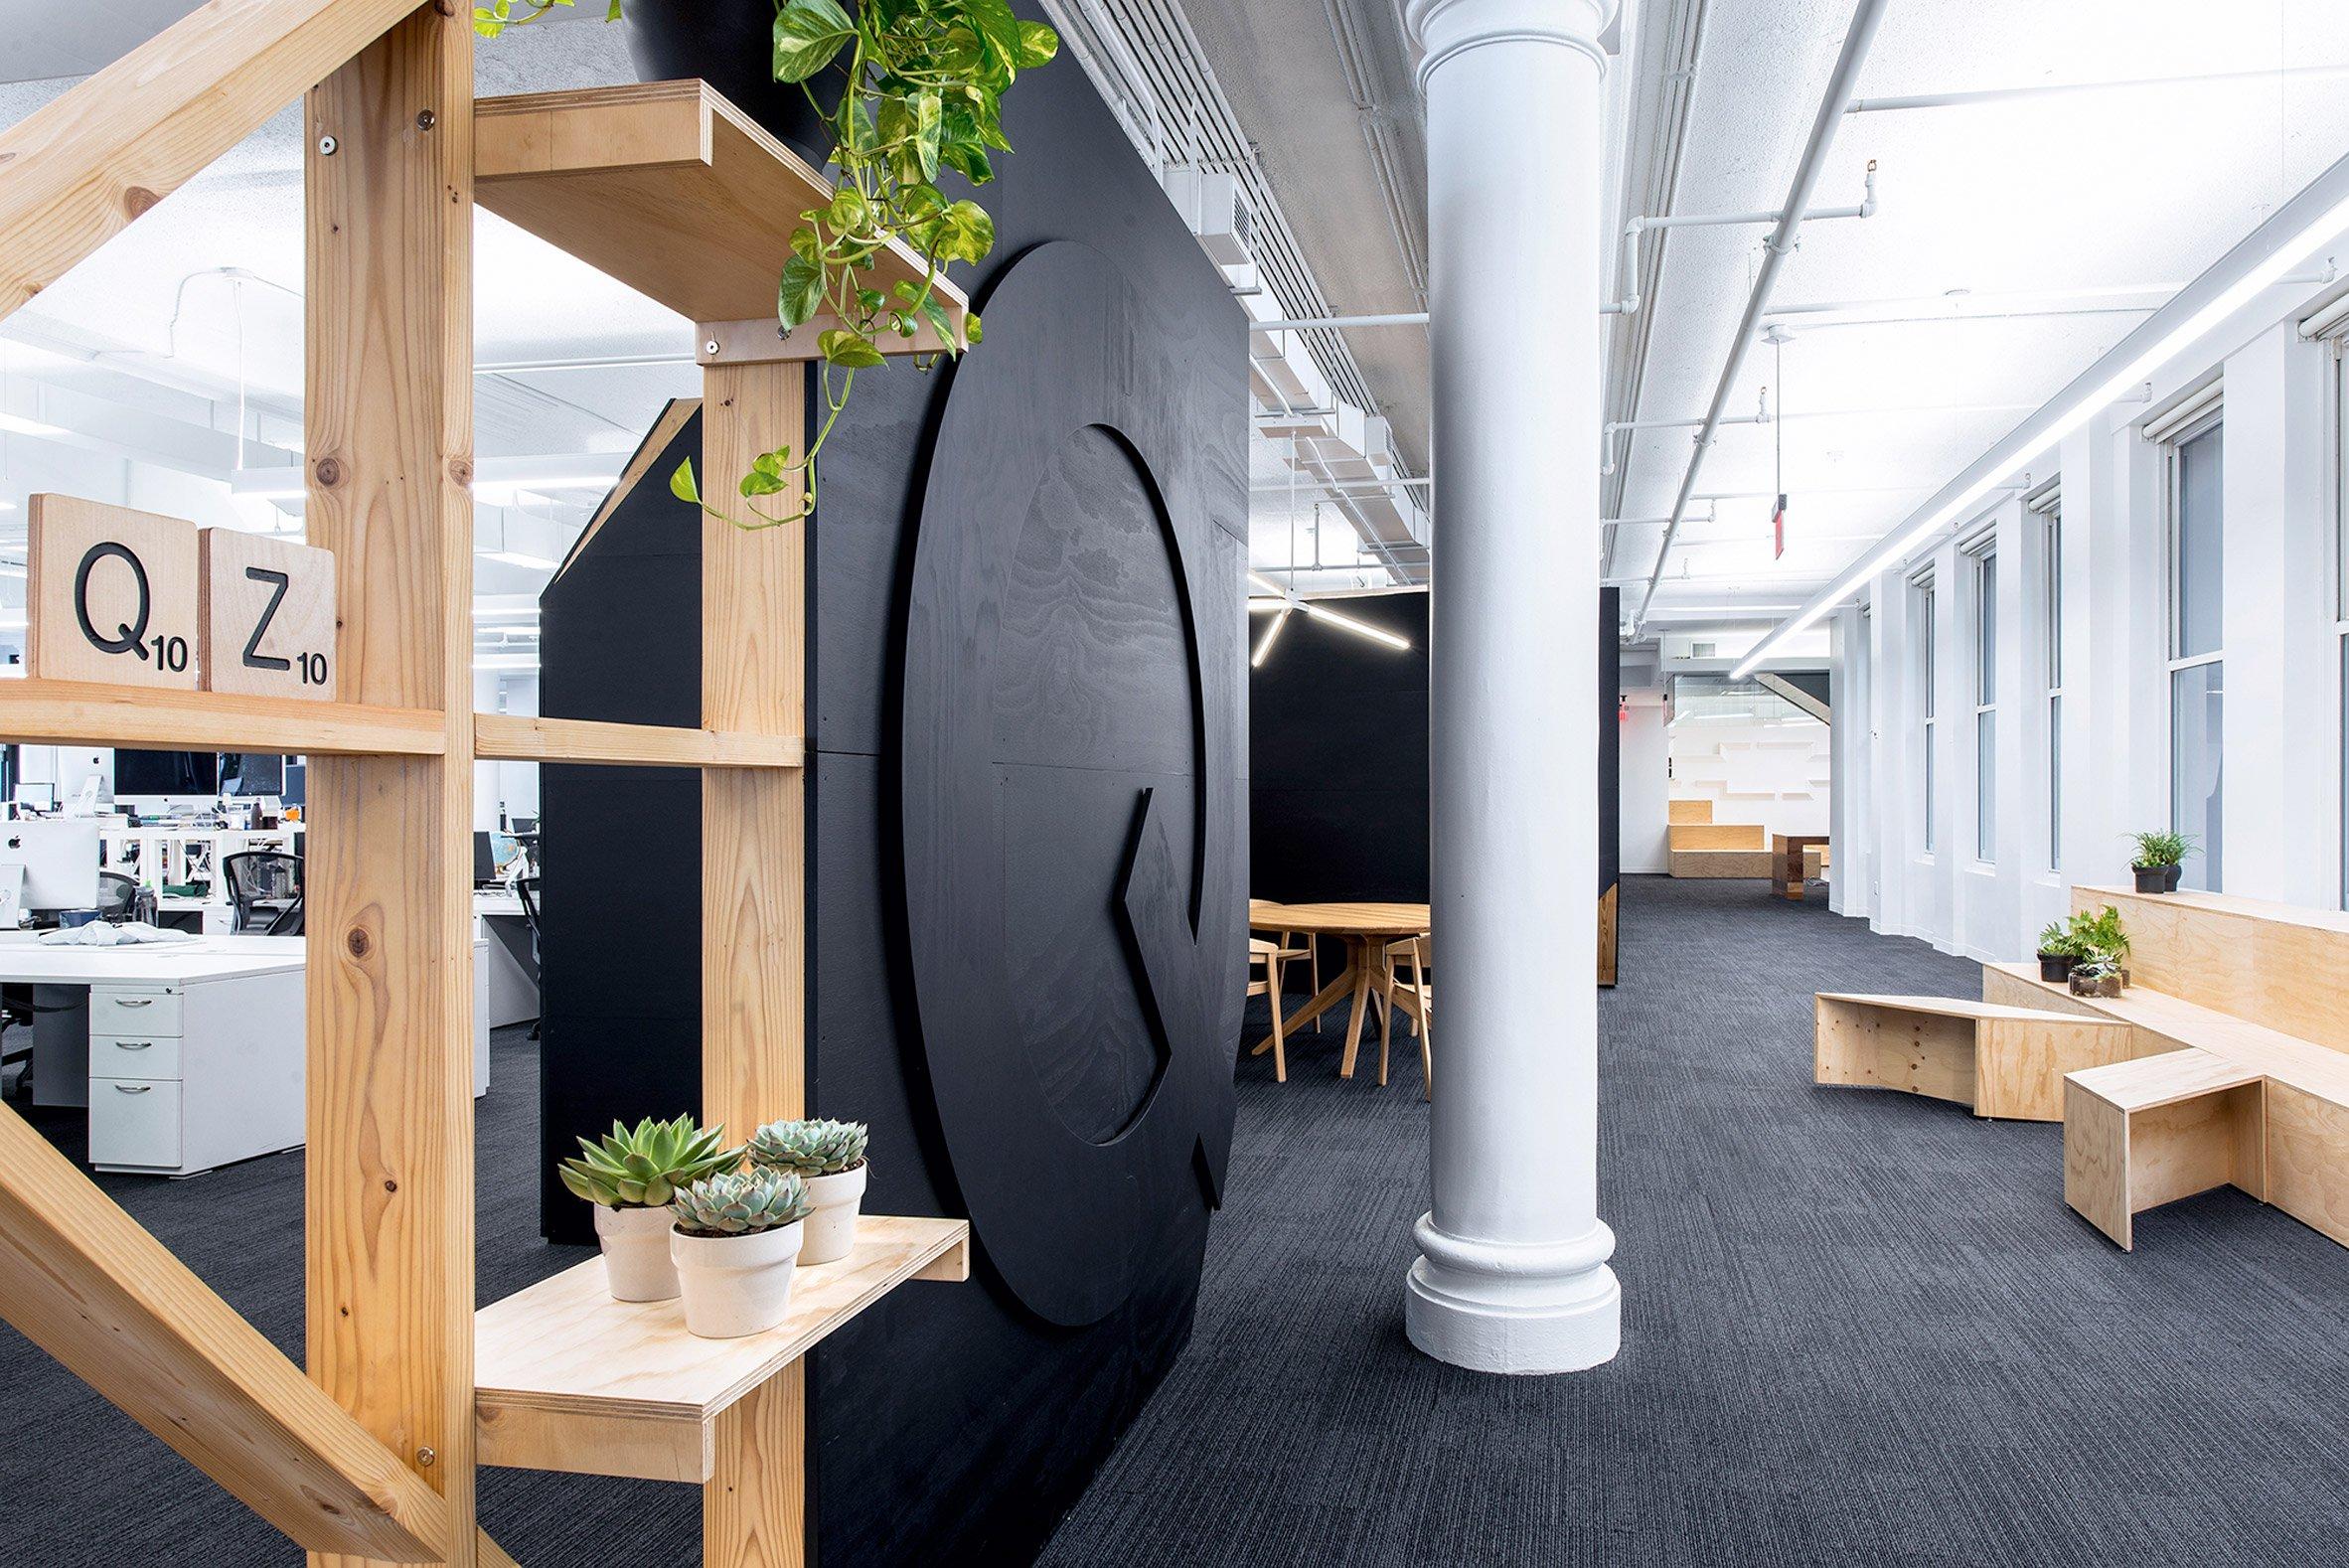 architecture-interiors-offices- manhatten-new-york-design-studia-osnovadesign-osnova-poltava_02